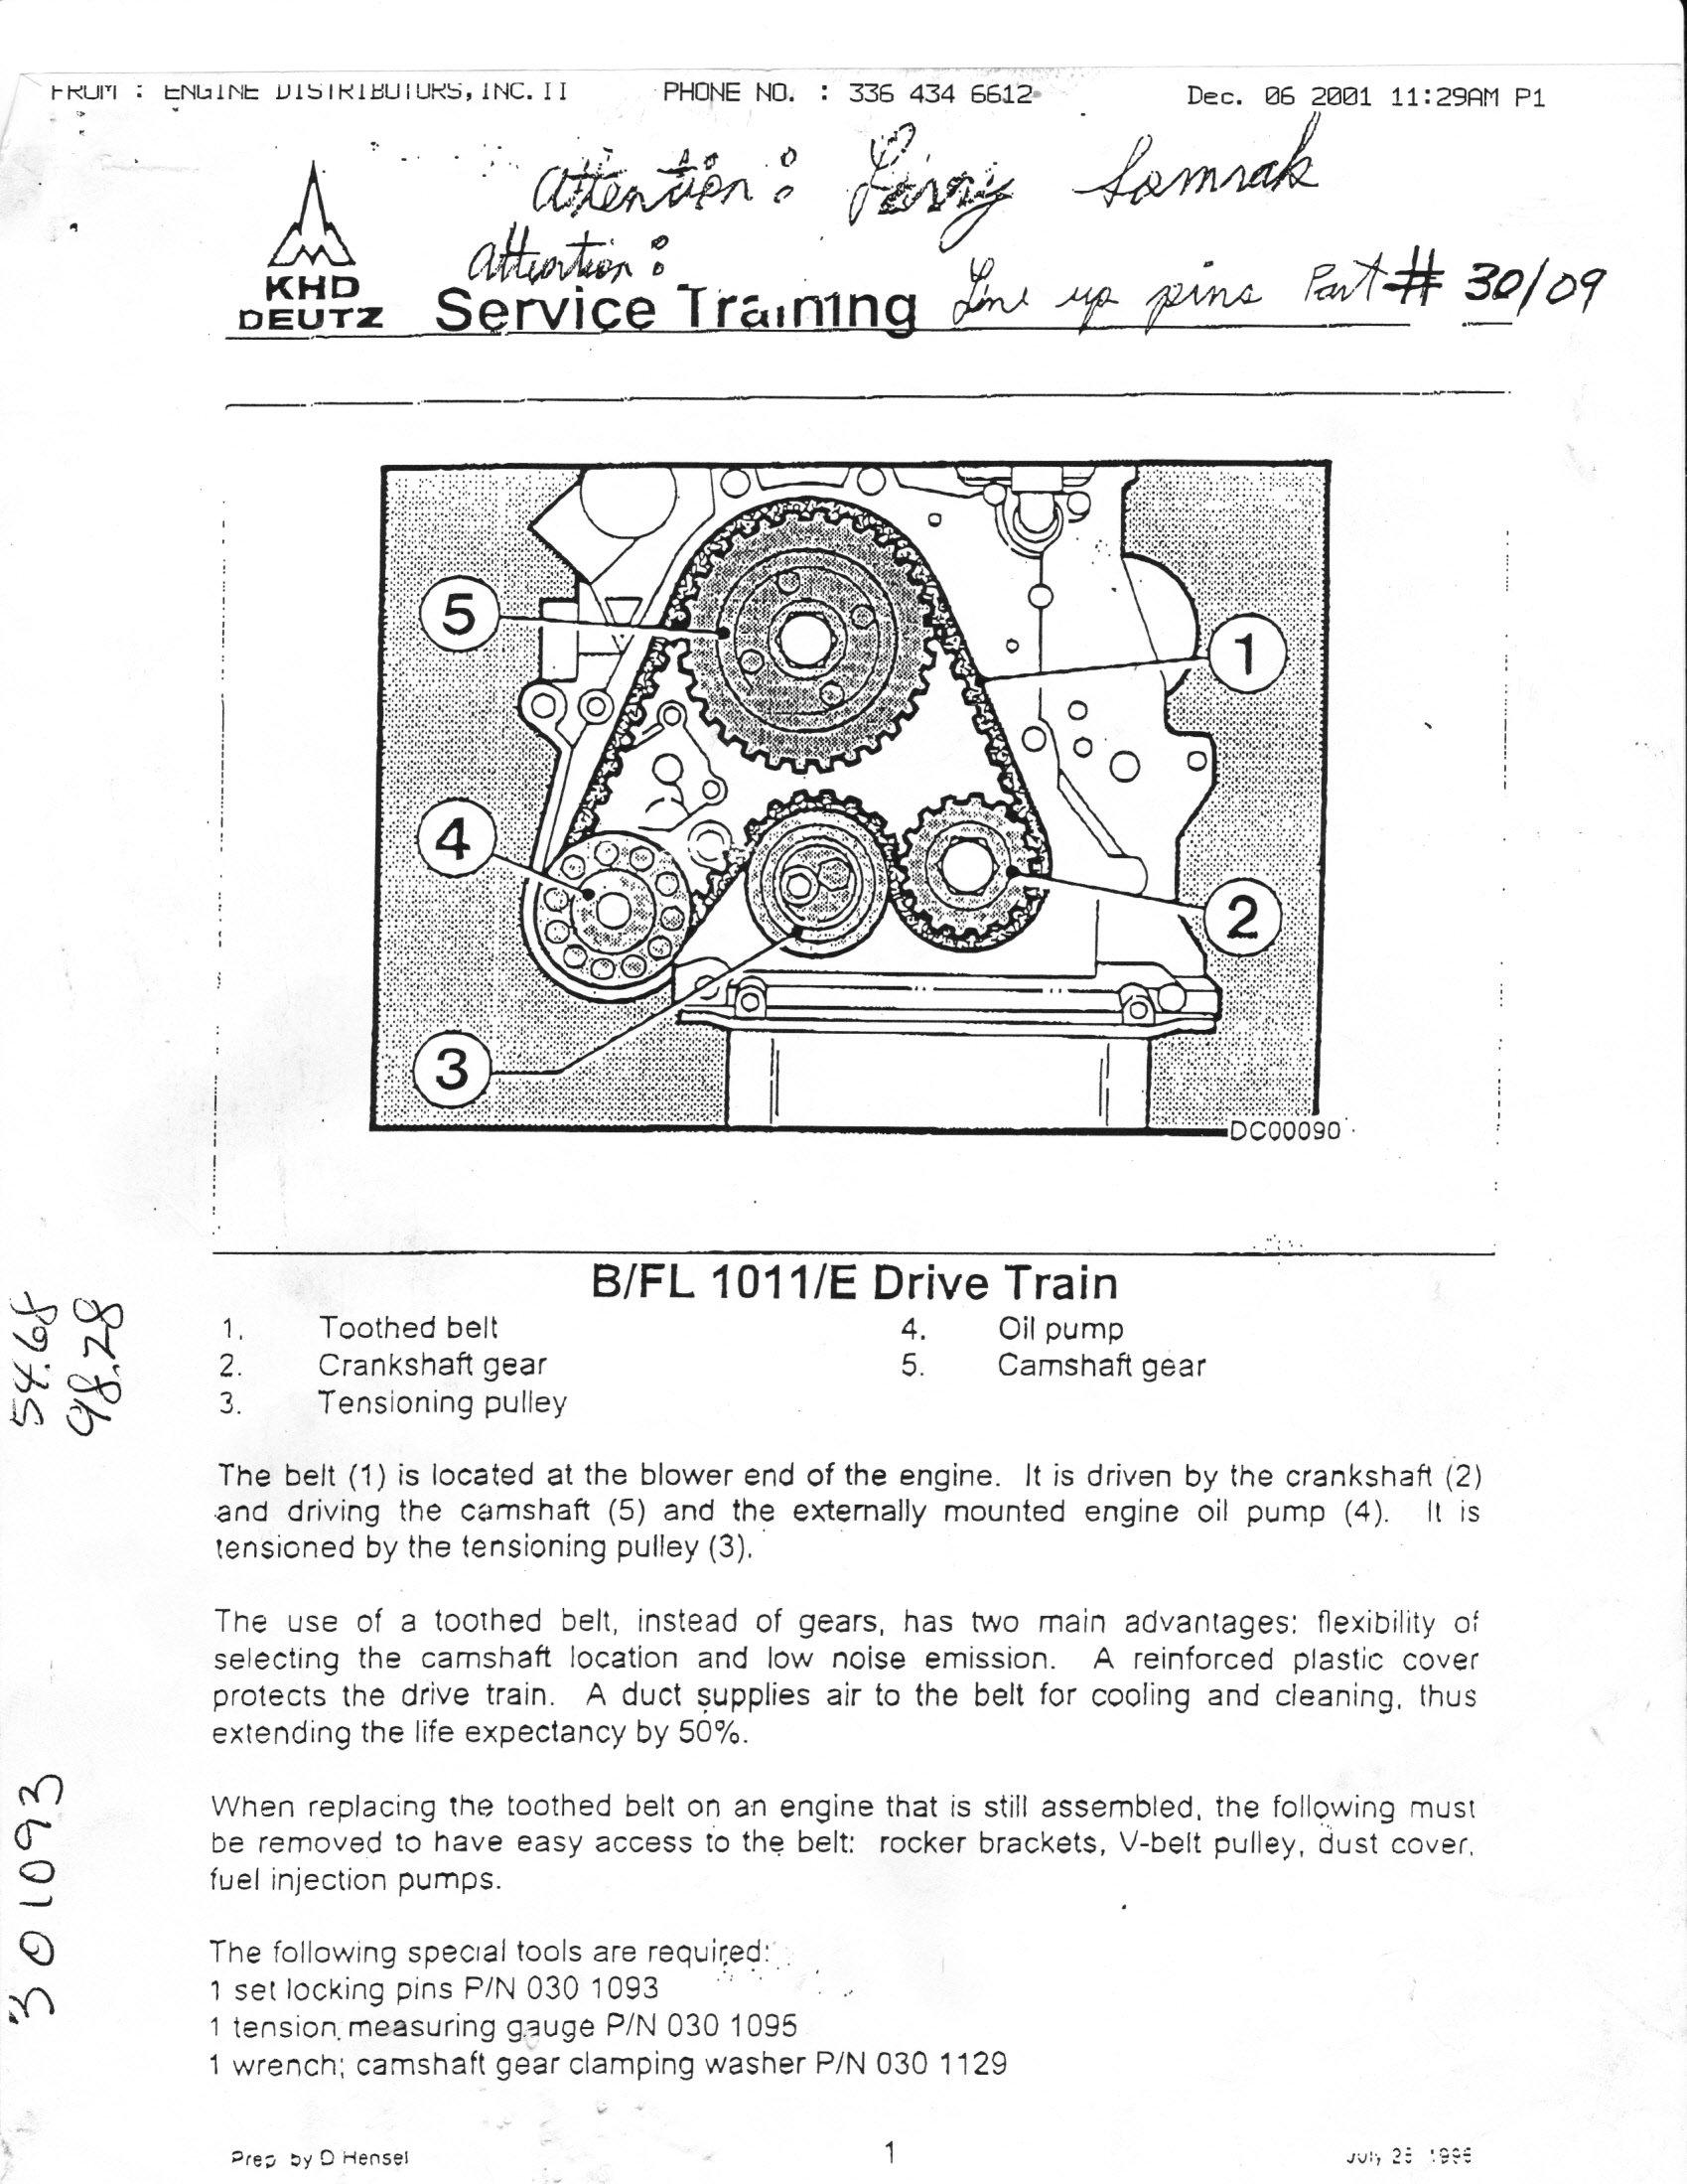 Deutz 1011 Engine Manual Deutz Free Engine Image For